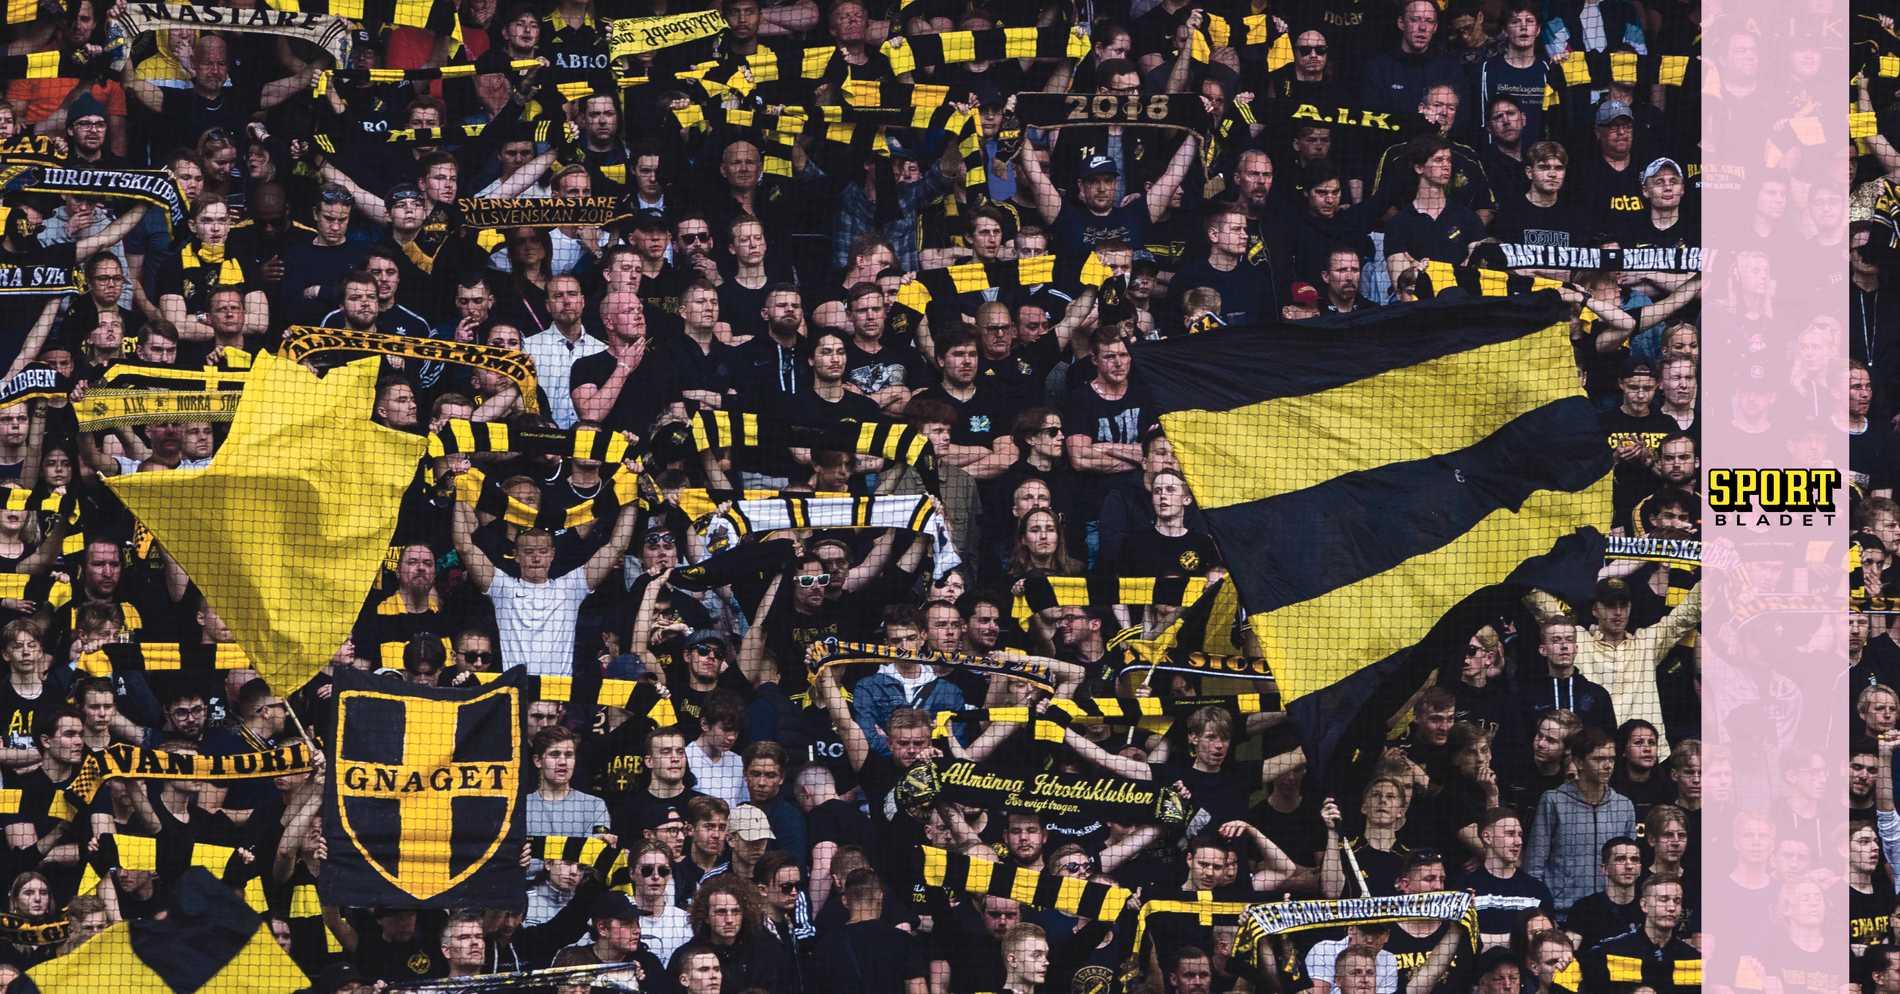 AIK öppnar tredje läktaren inför derbyt